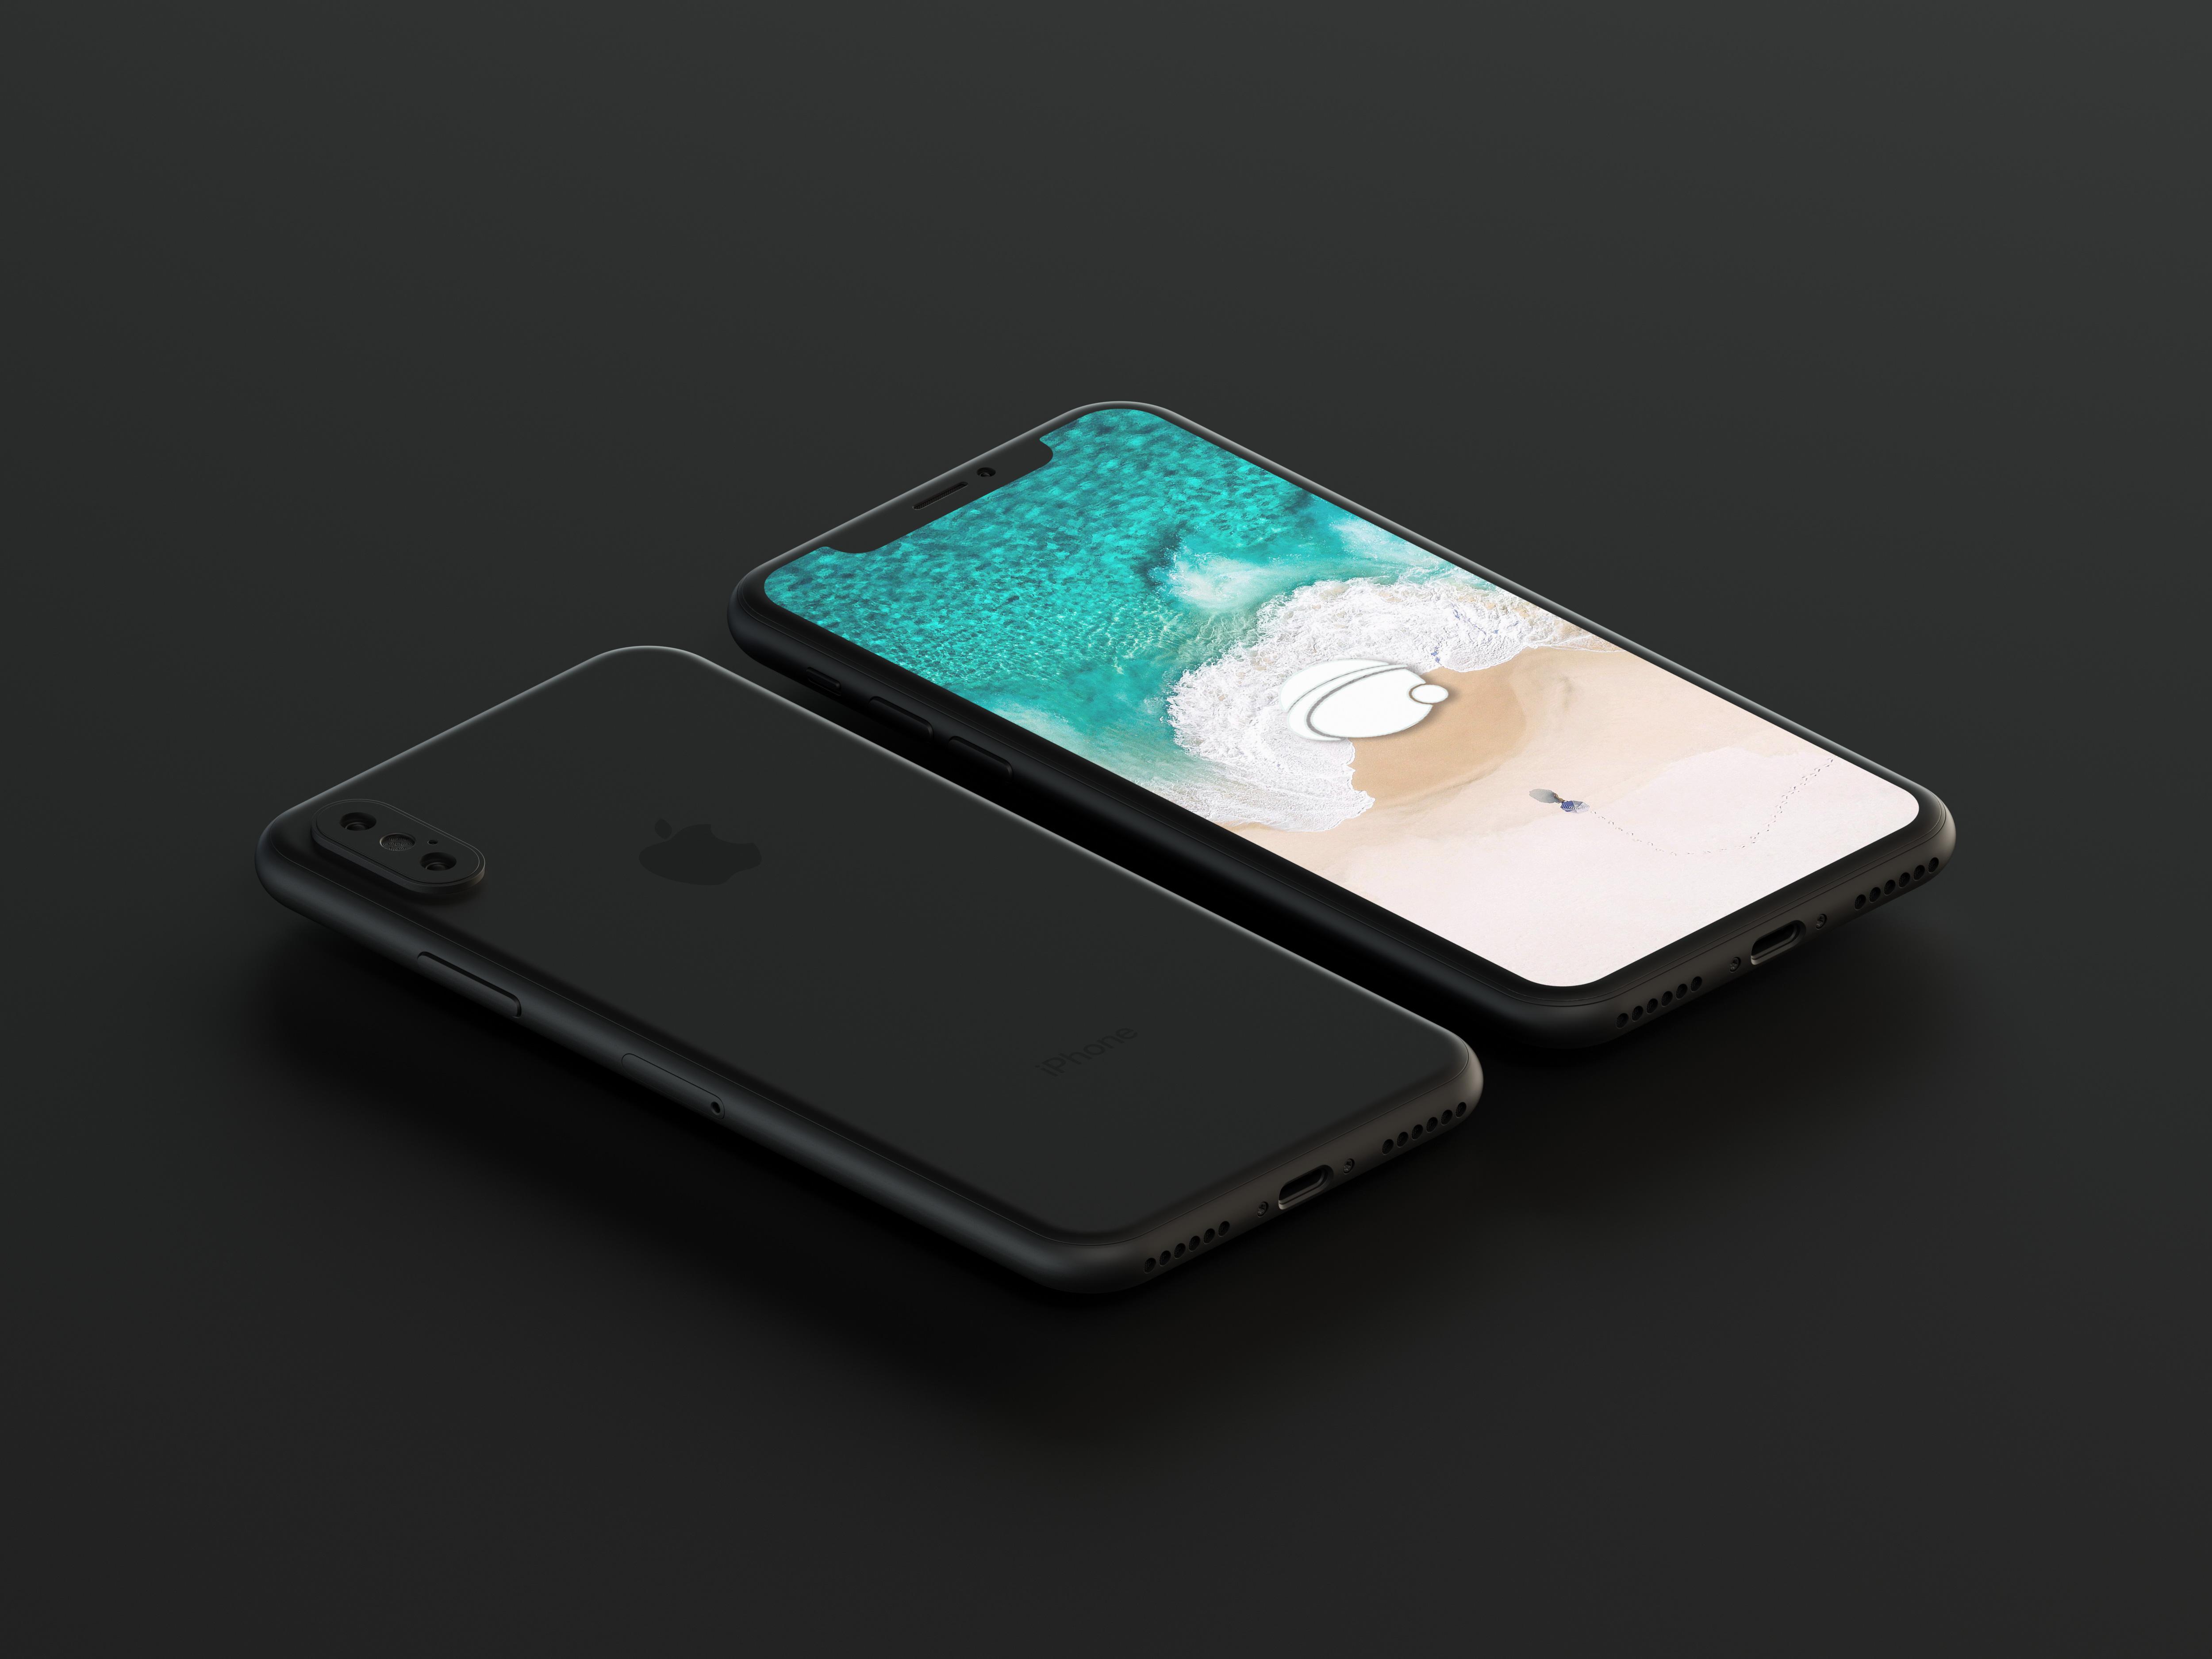 1582361505 458efe77124d0c0 - 简约iPhoneXR智能手机样机